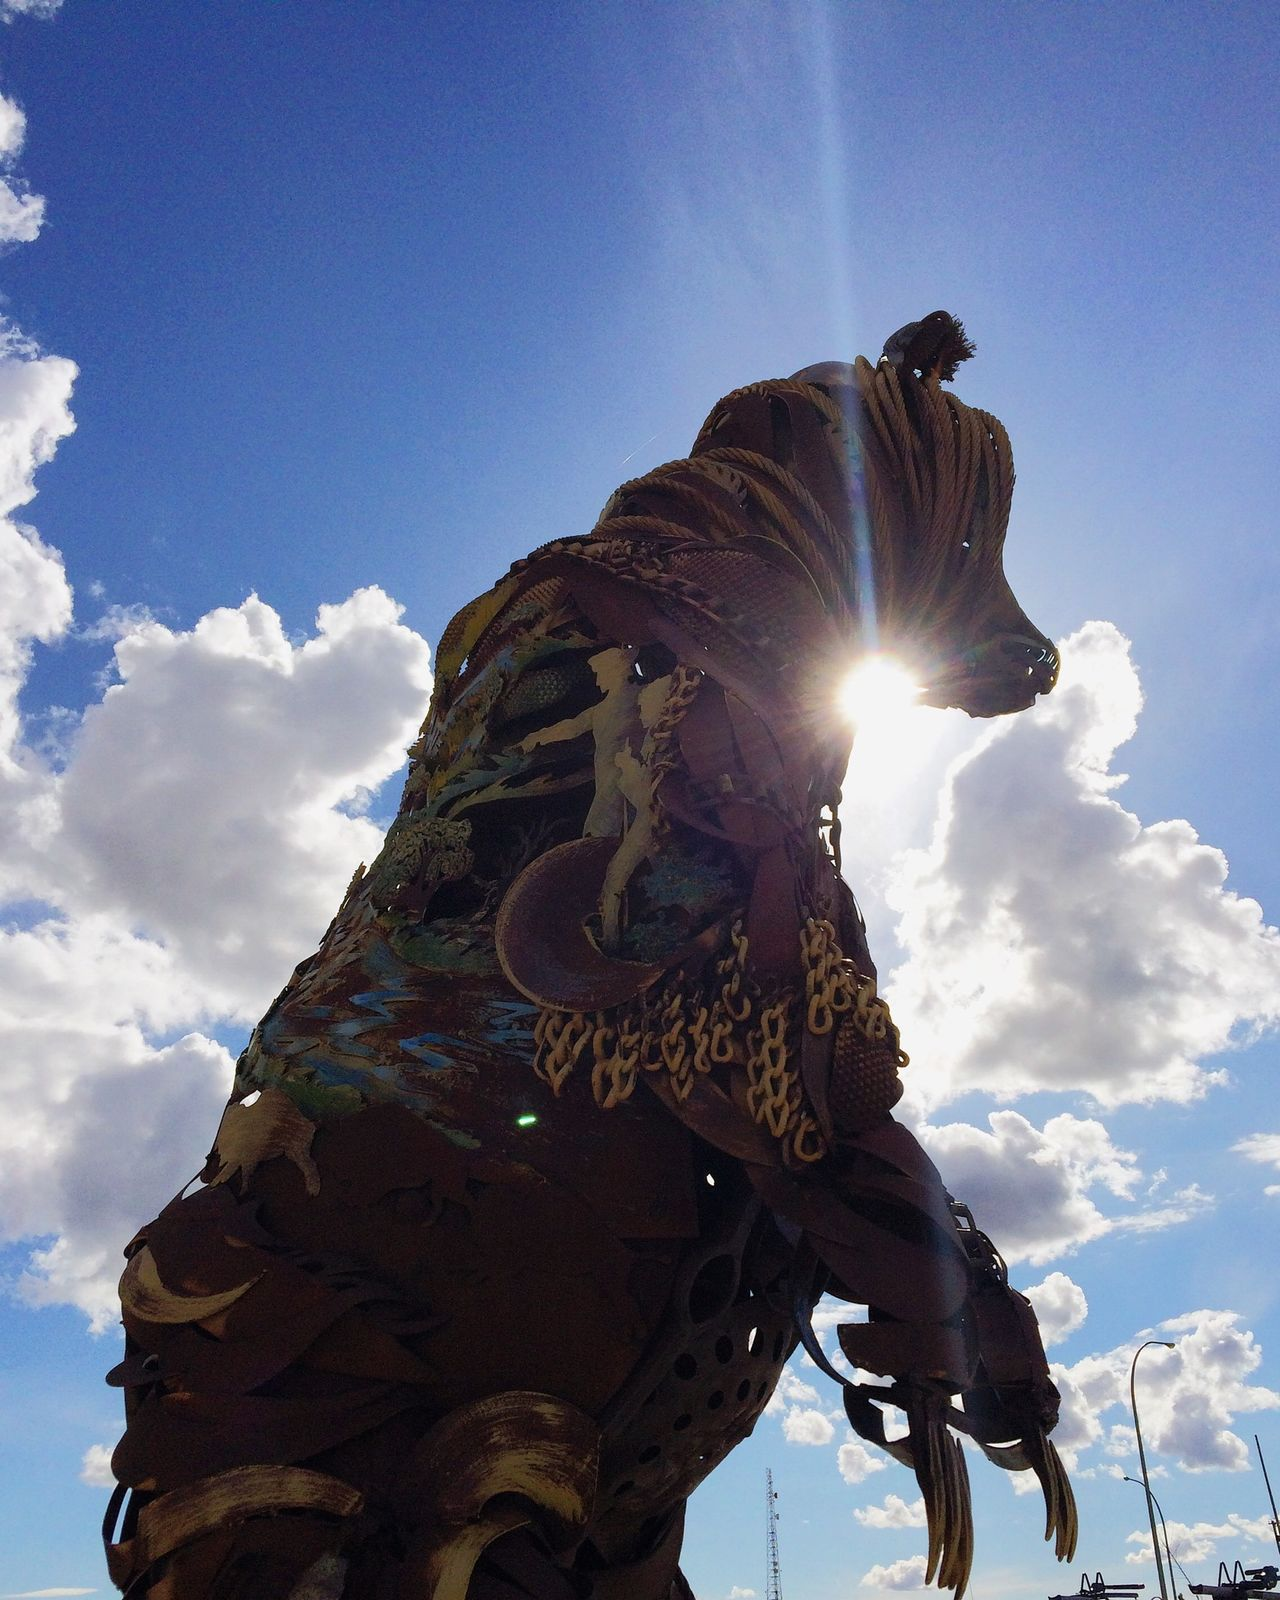 what a great piece Northdakota Sculpture